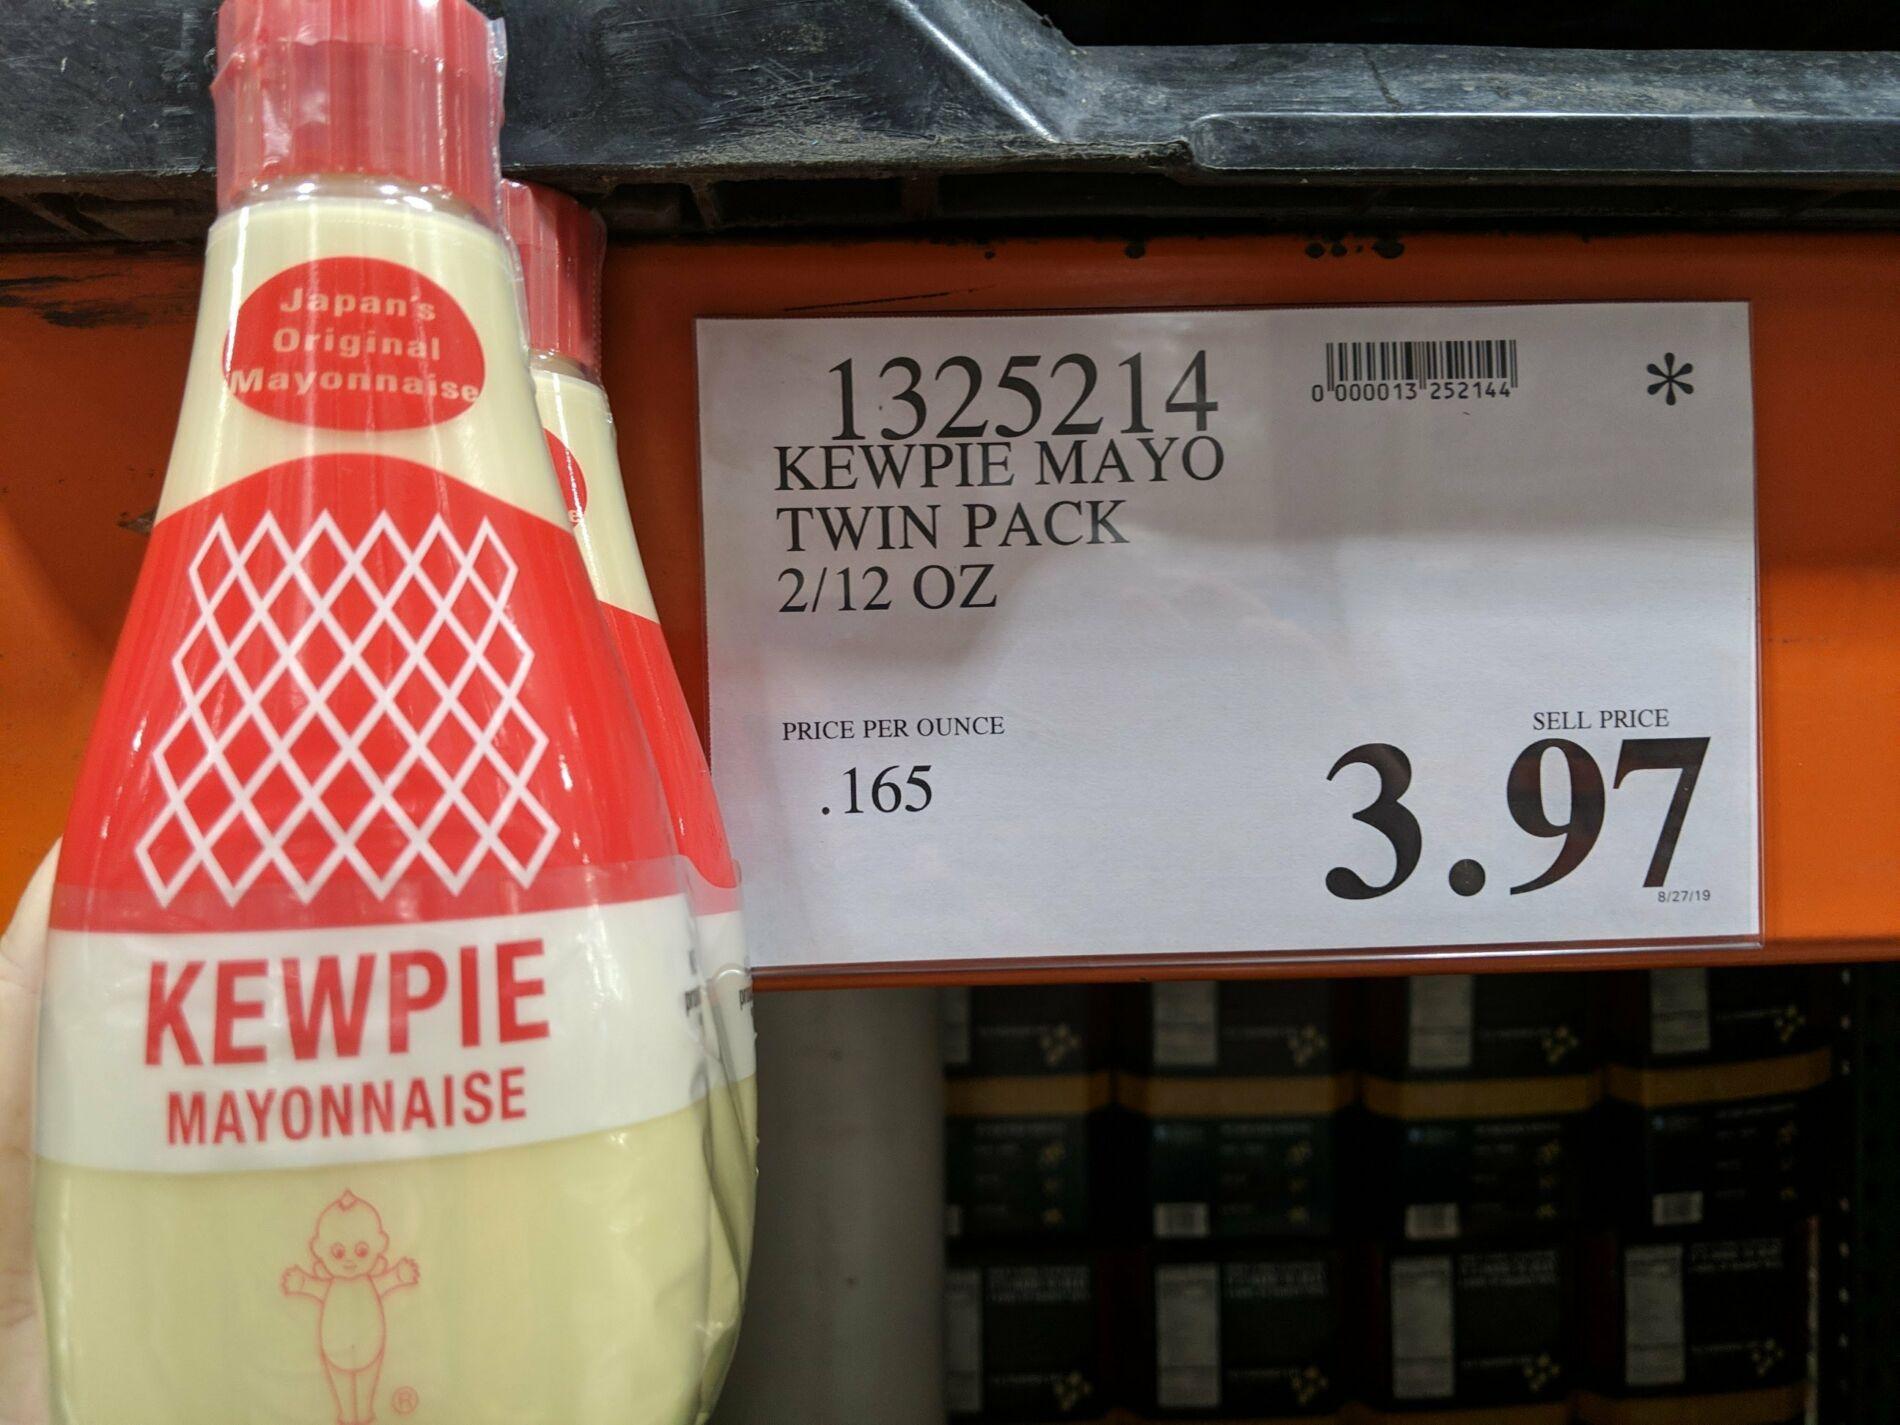 Kewpie Mayo Twin Pack 3 97 Costco Clearance Kewpie Twin Pack Costco Locations